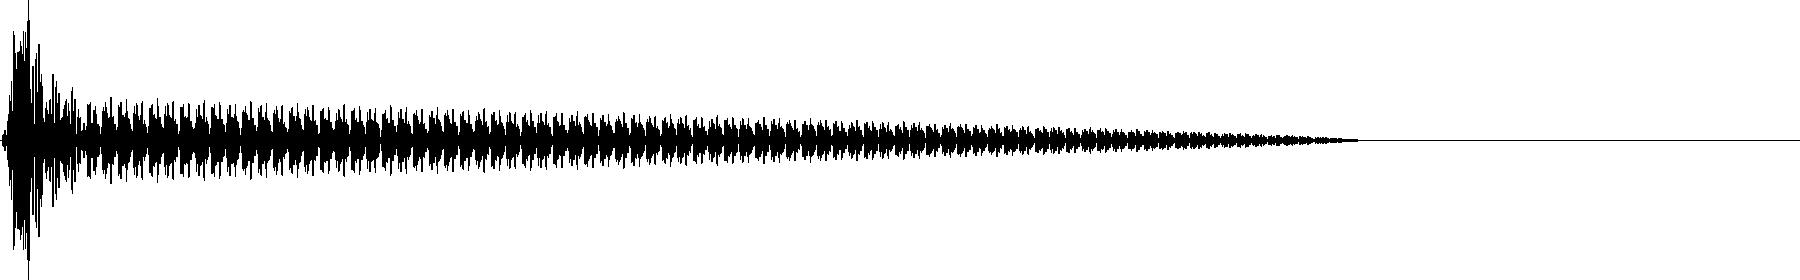 11 808 r8